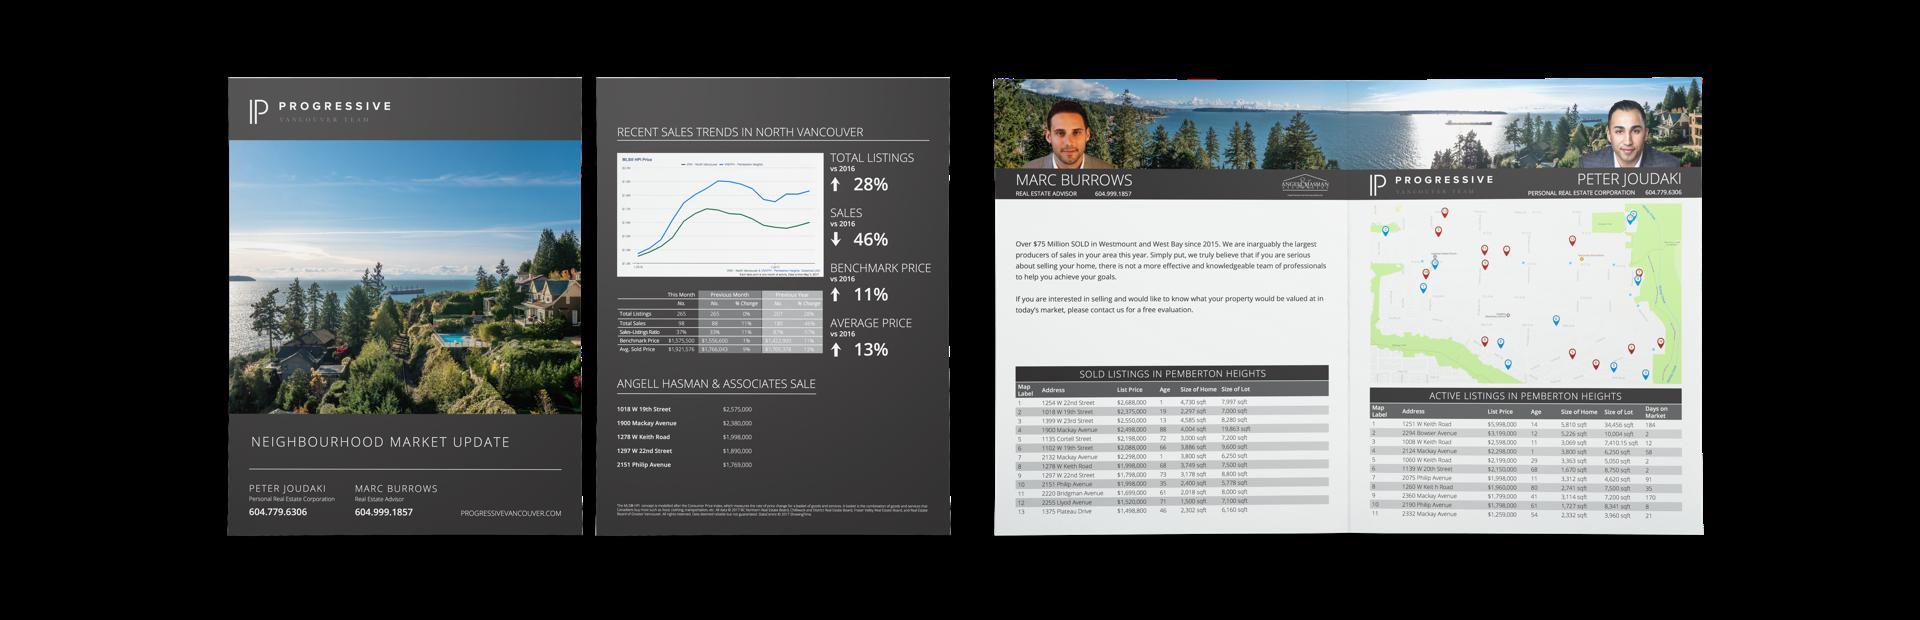 Progressive Vancouver Real Estate Agents Web design and marketing branding - stationary display